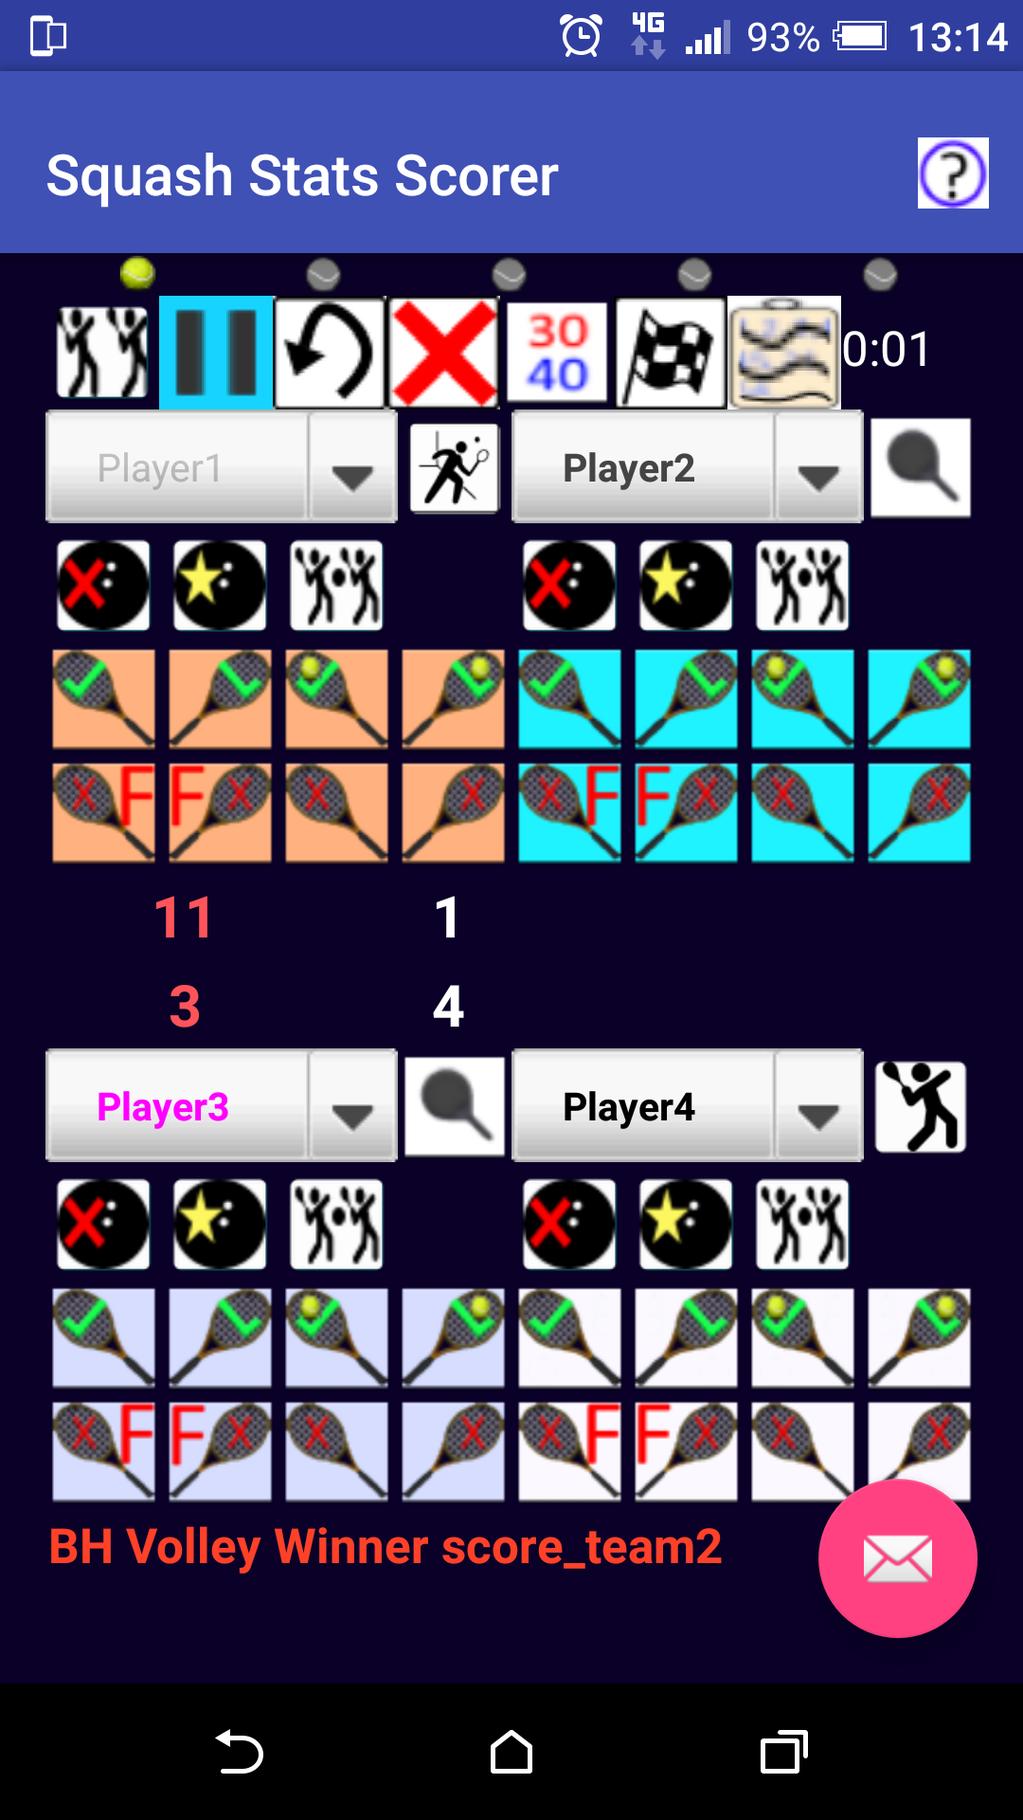 Squash Stats Scorer Screenshot 9